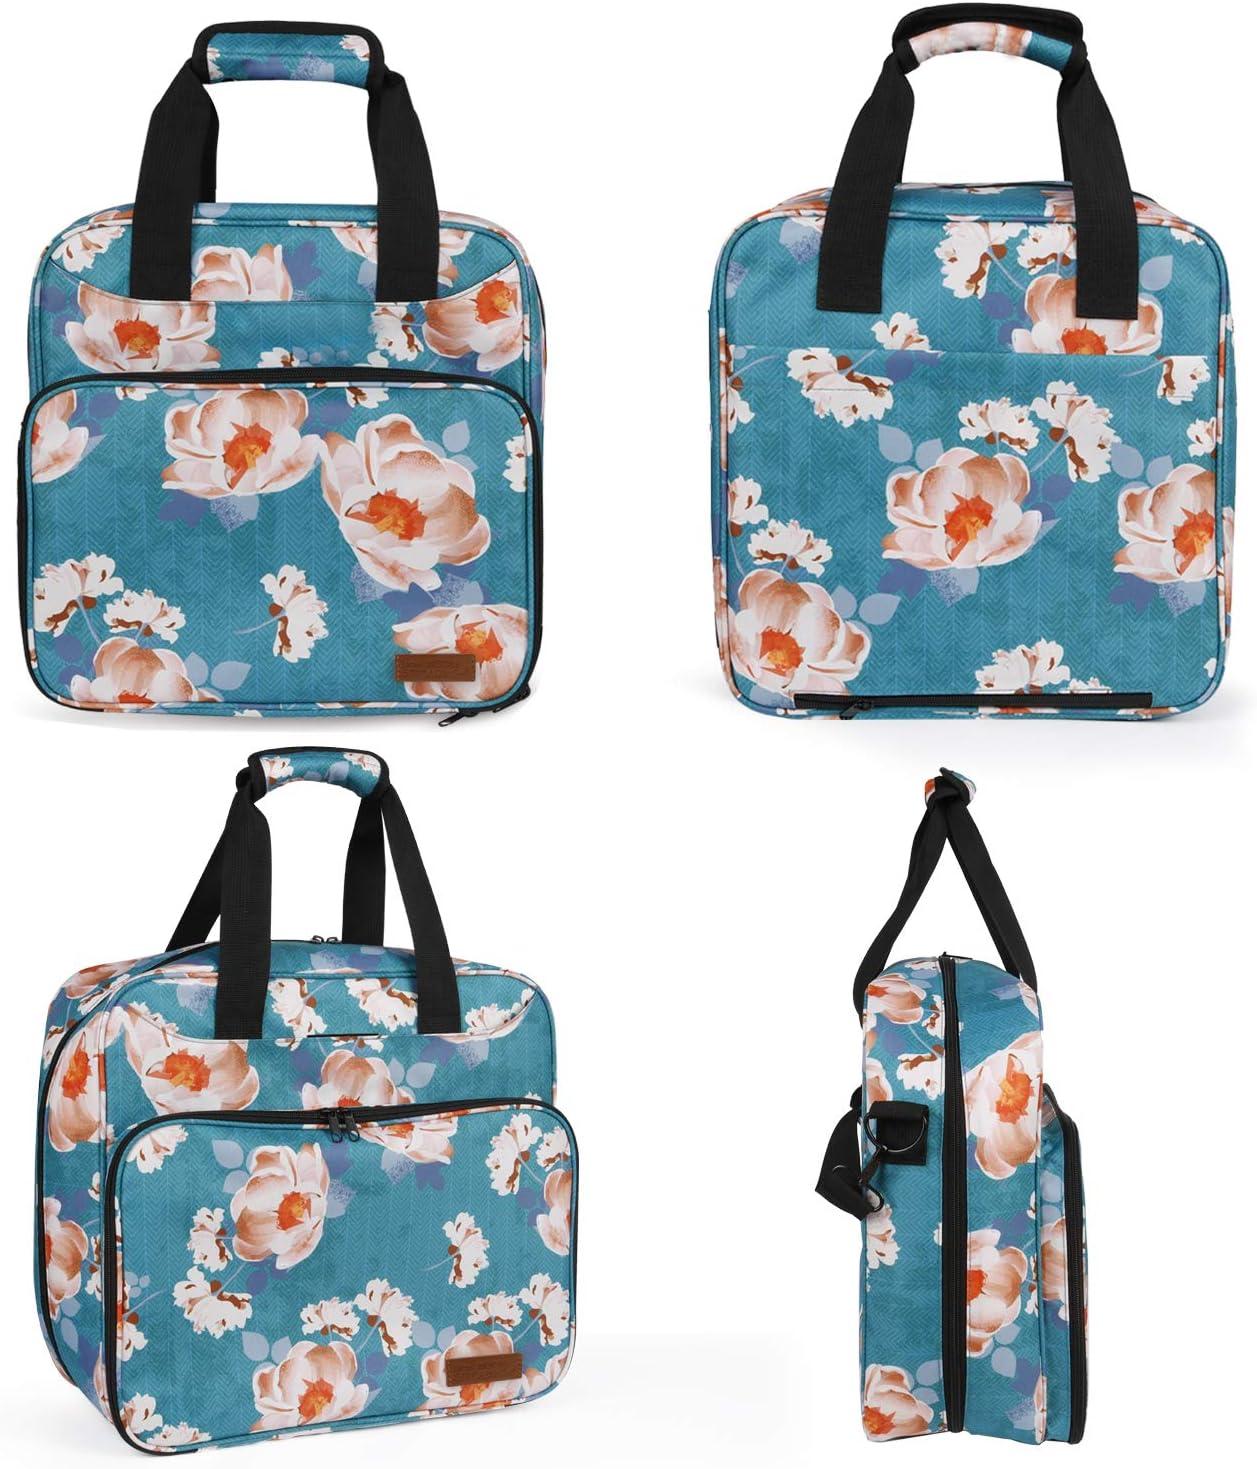 Protective Pouch Tote Bags Organizer for Cricut Machine Supplies Natur@cho Cricut Storage Carrying Case Cover Bag for Cricut Easy Press Mini 9x9